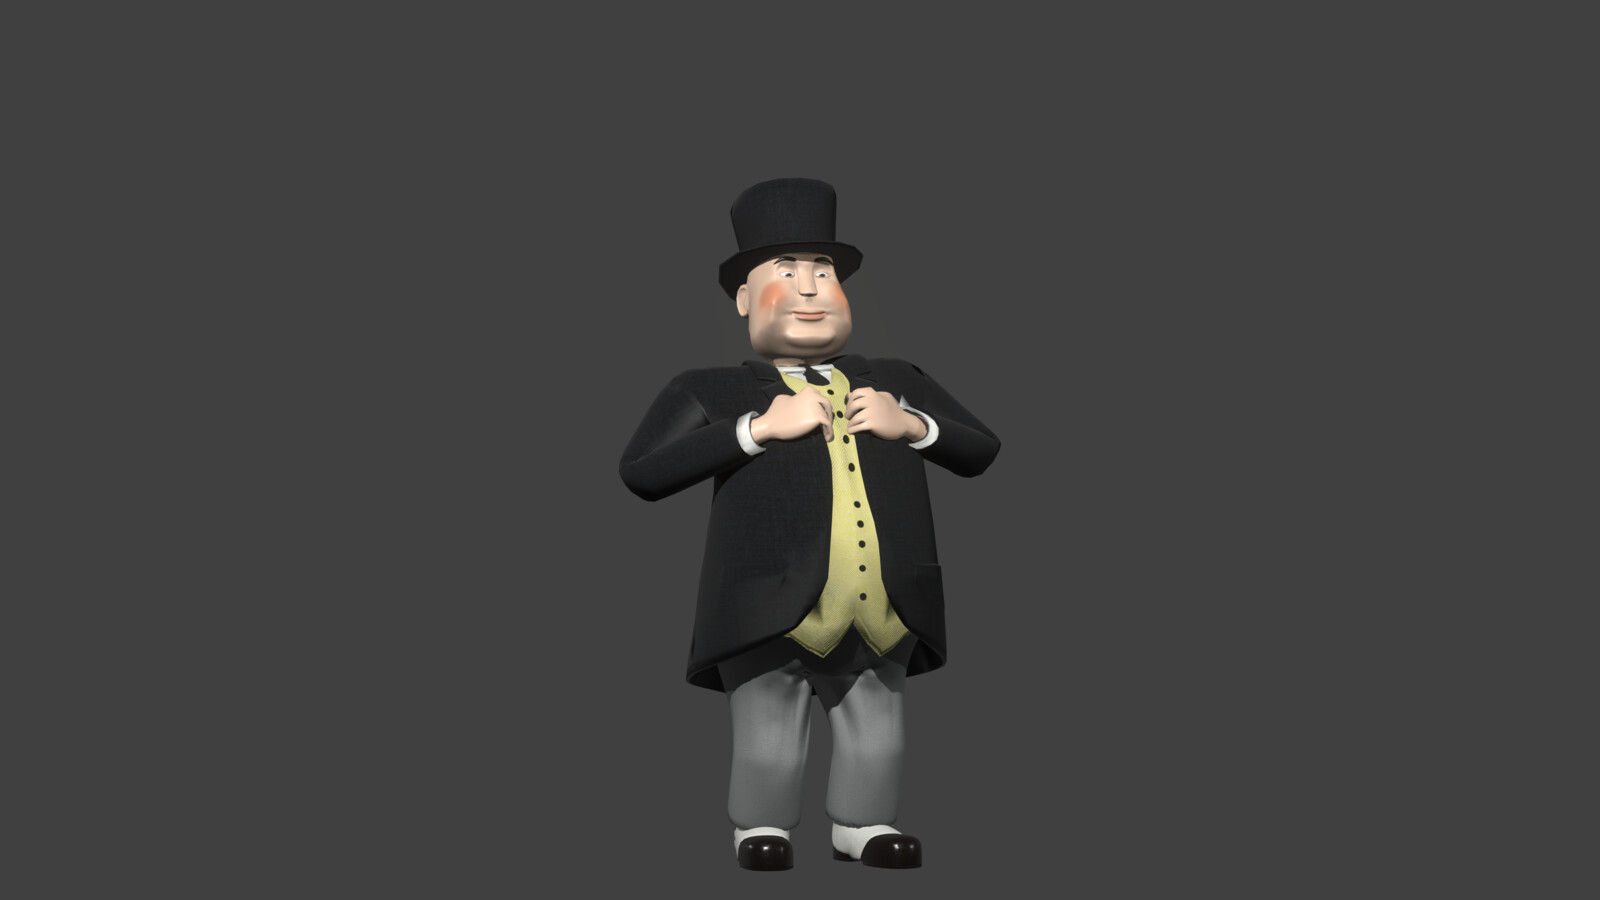 Thomas the Tank Engine: Sir Topham Hatt